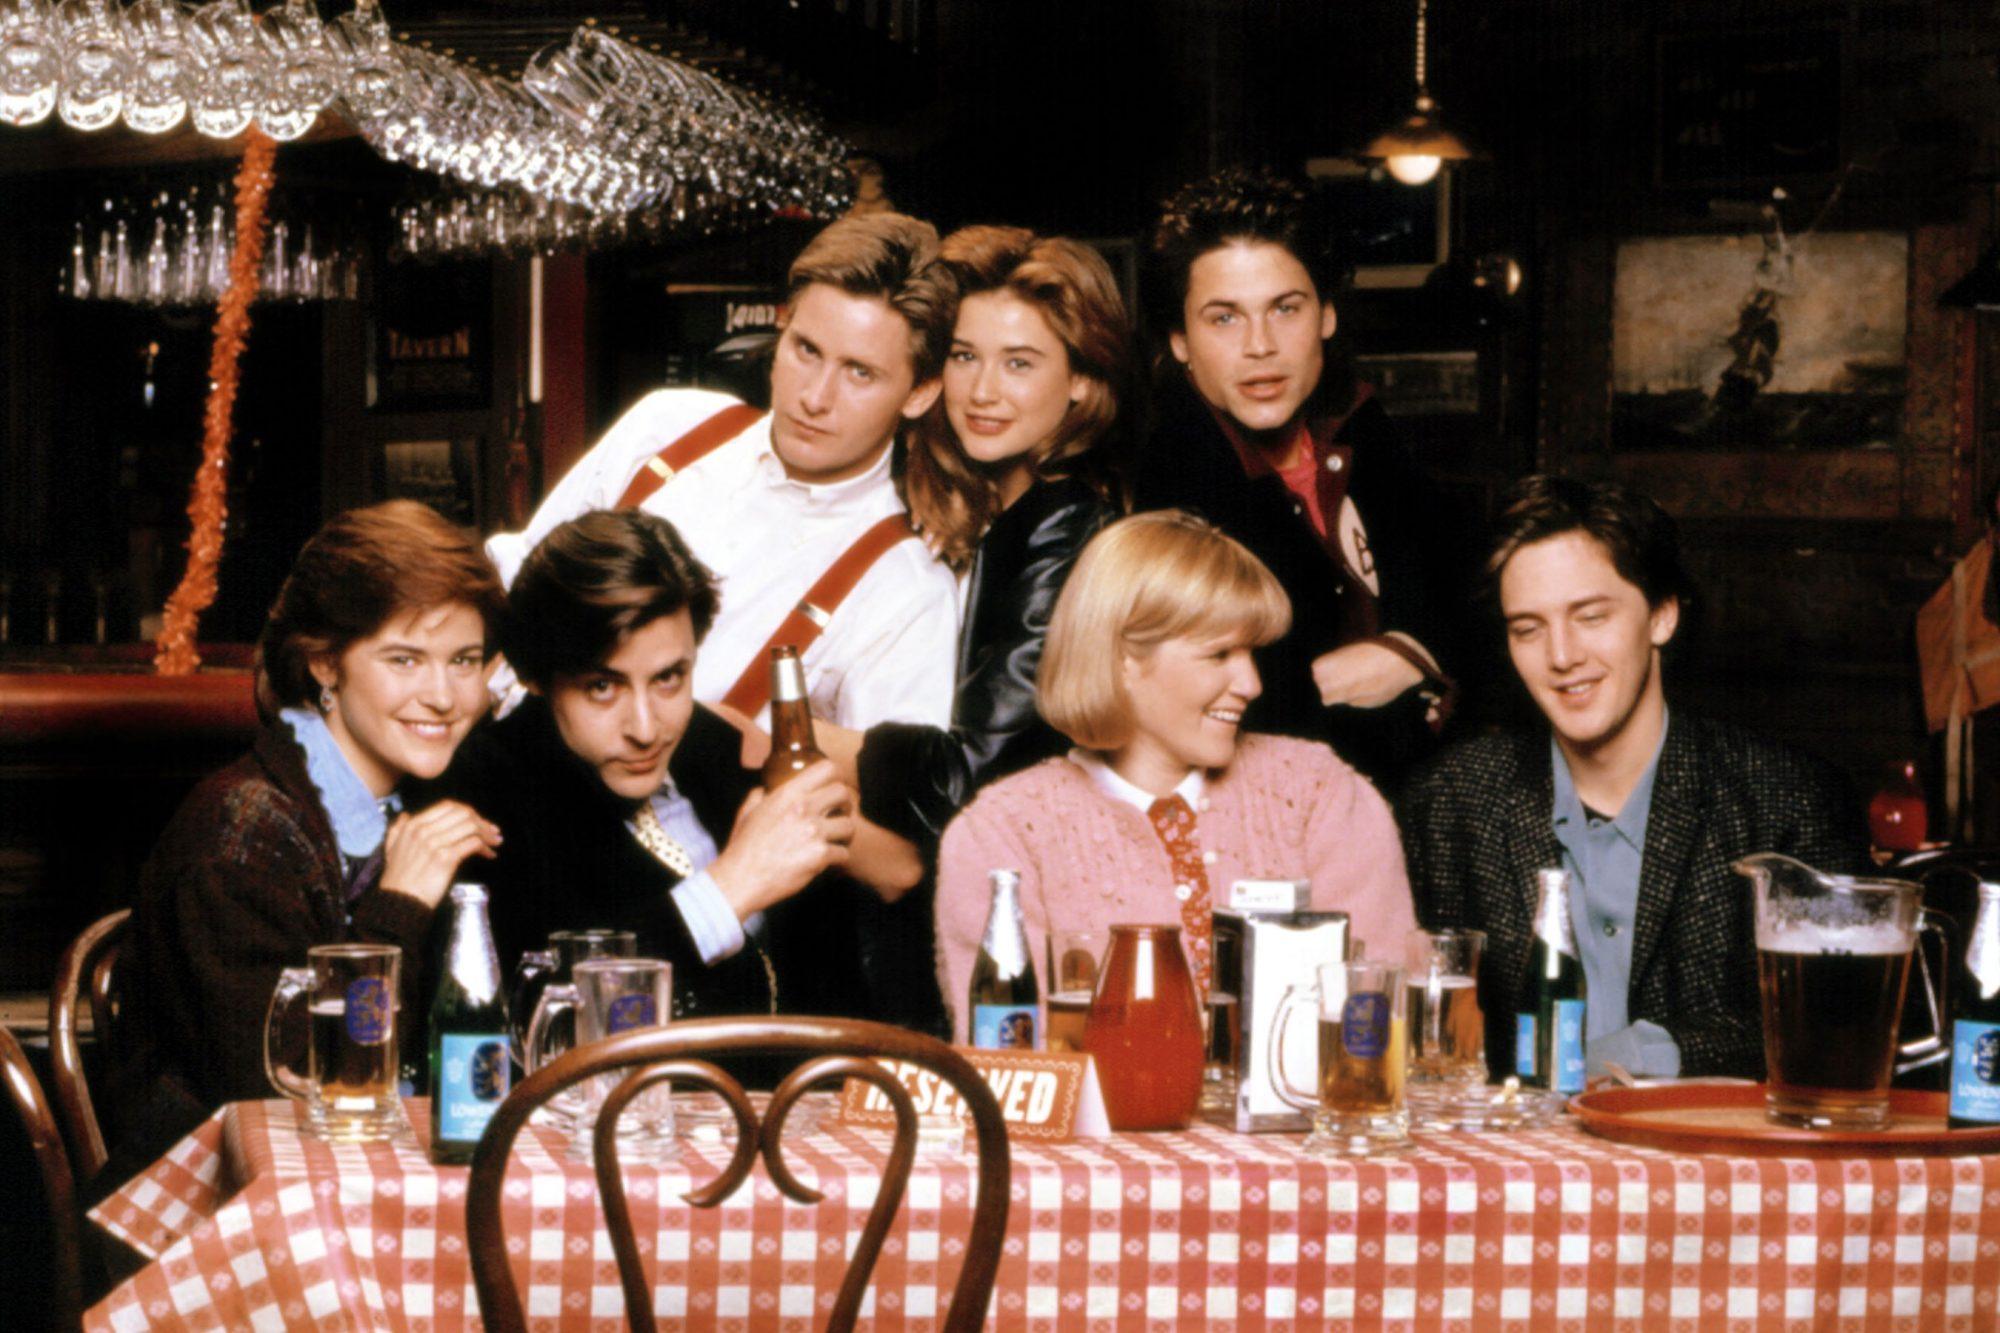 ST. ELMO'S FIRE, Ally Sheedy, Judd Nelson, Emilio Estevez, Demi Moore, Mare Winningham, Rob Lowe, An